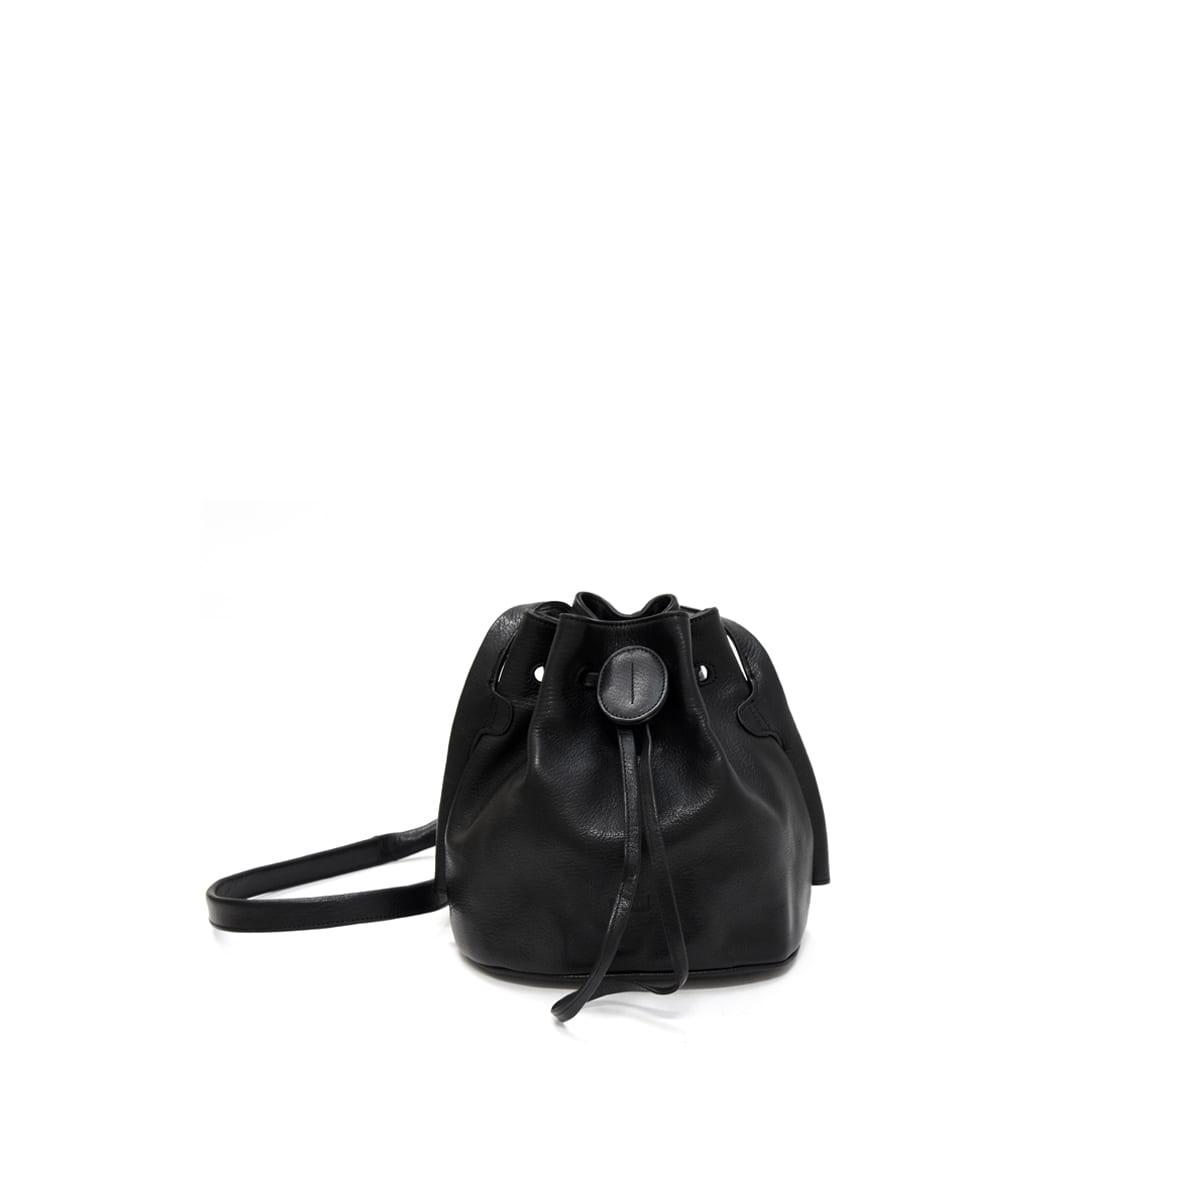 9b6eee8924079 Beata Small Bucket Bag Black – Lumi Accessories